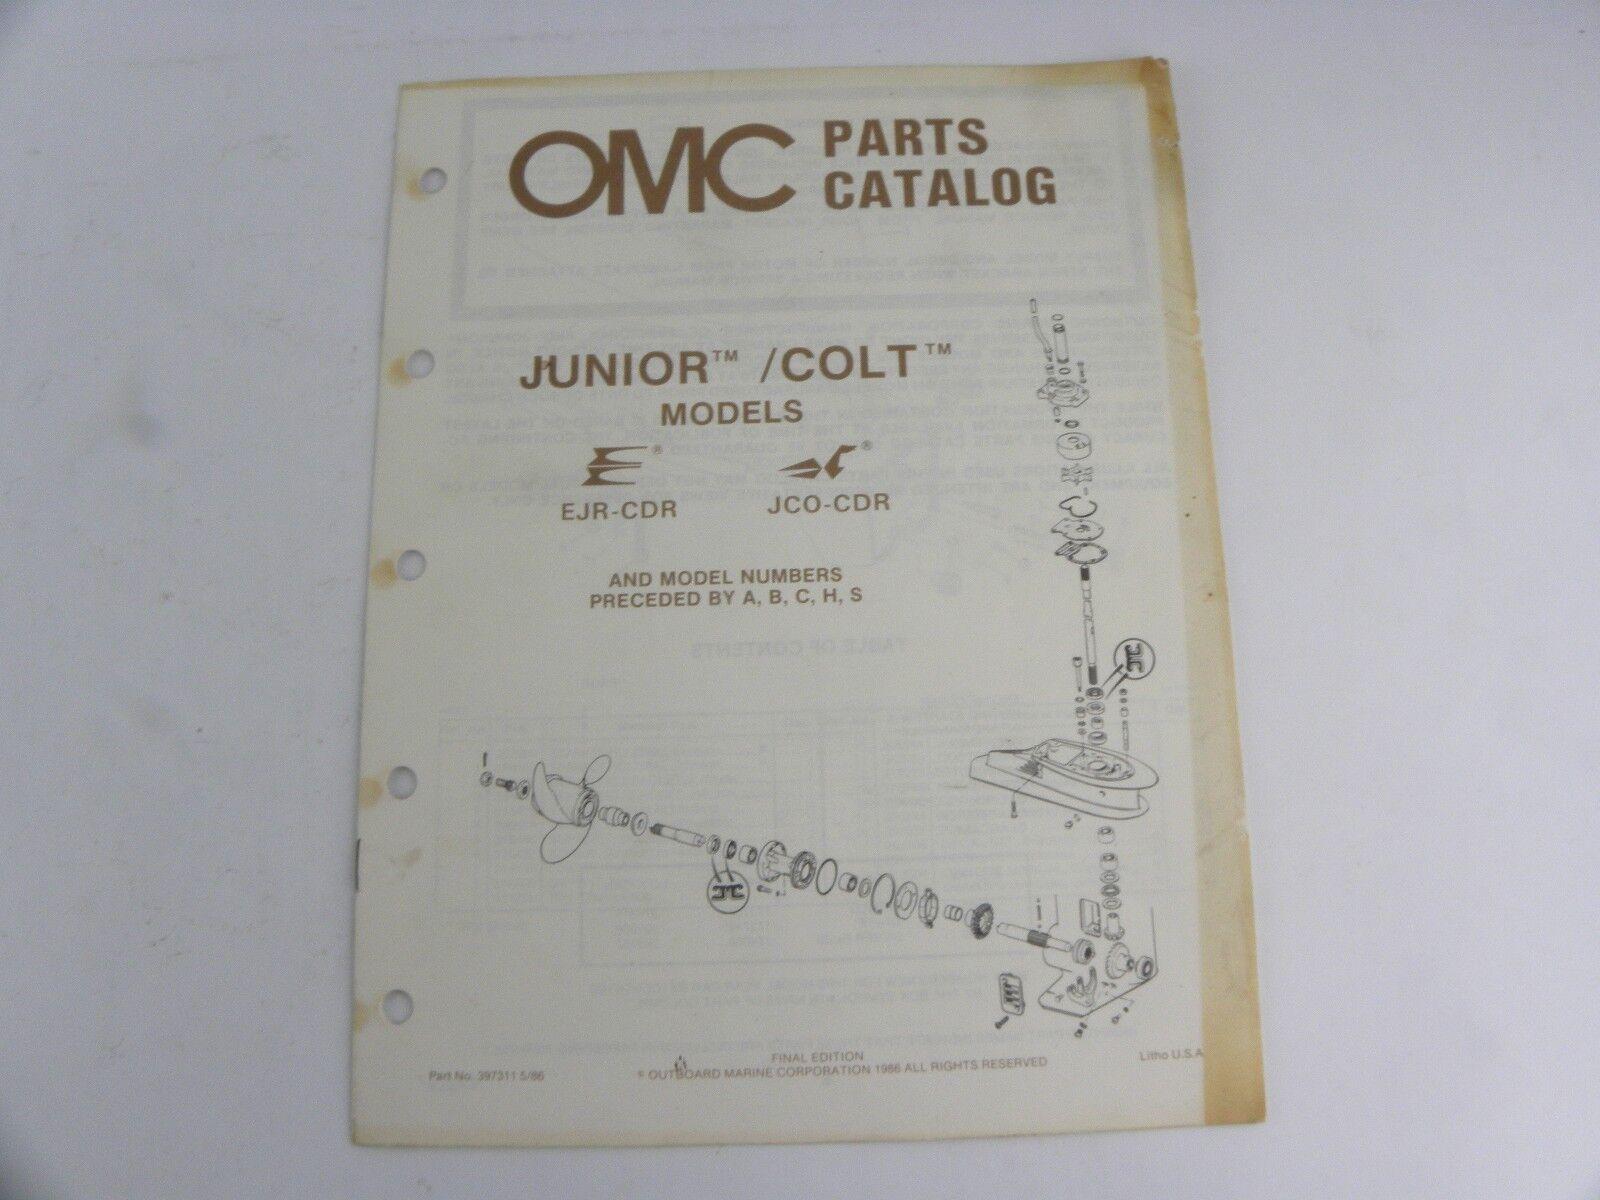 Evinrude Johnson Junior Colt Models Outboard Motor Parts Catalog Manual 1986 OMC